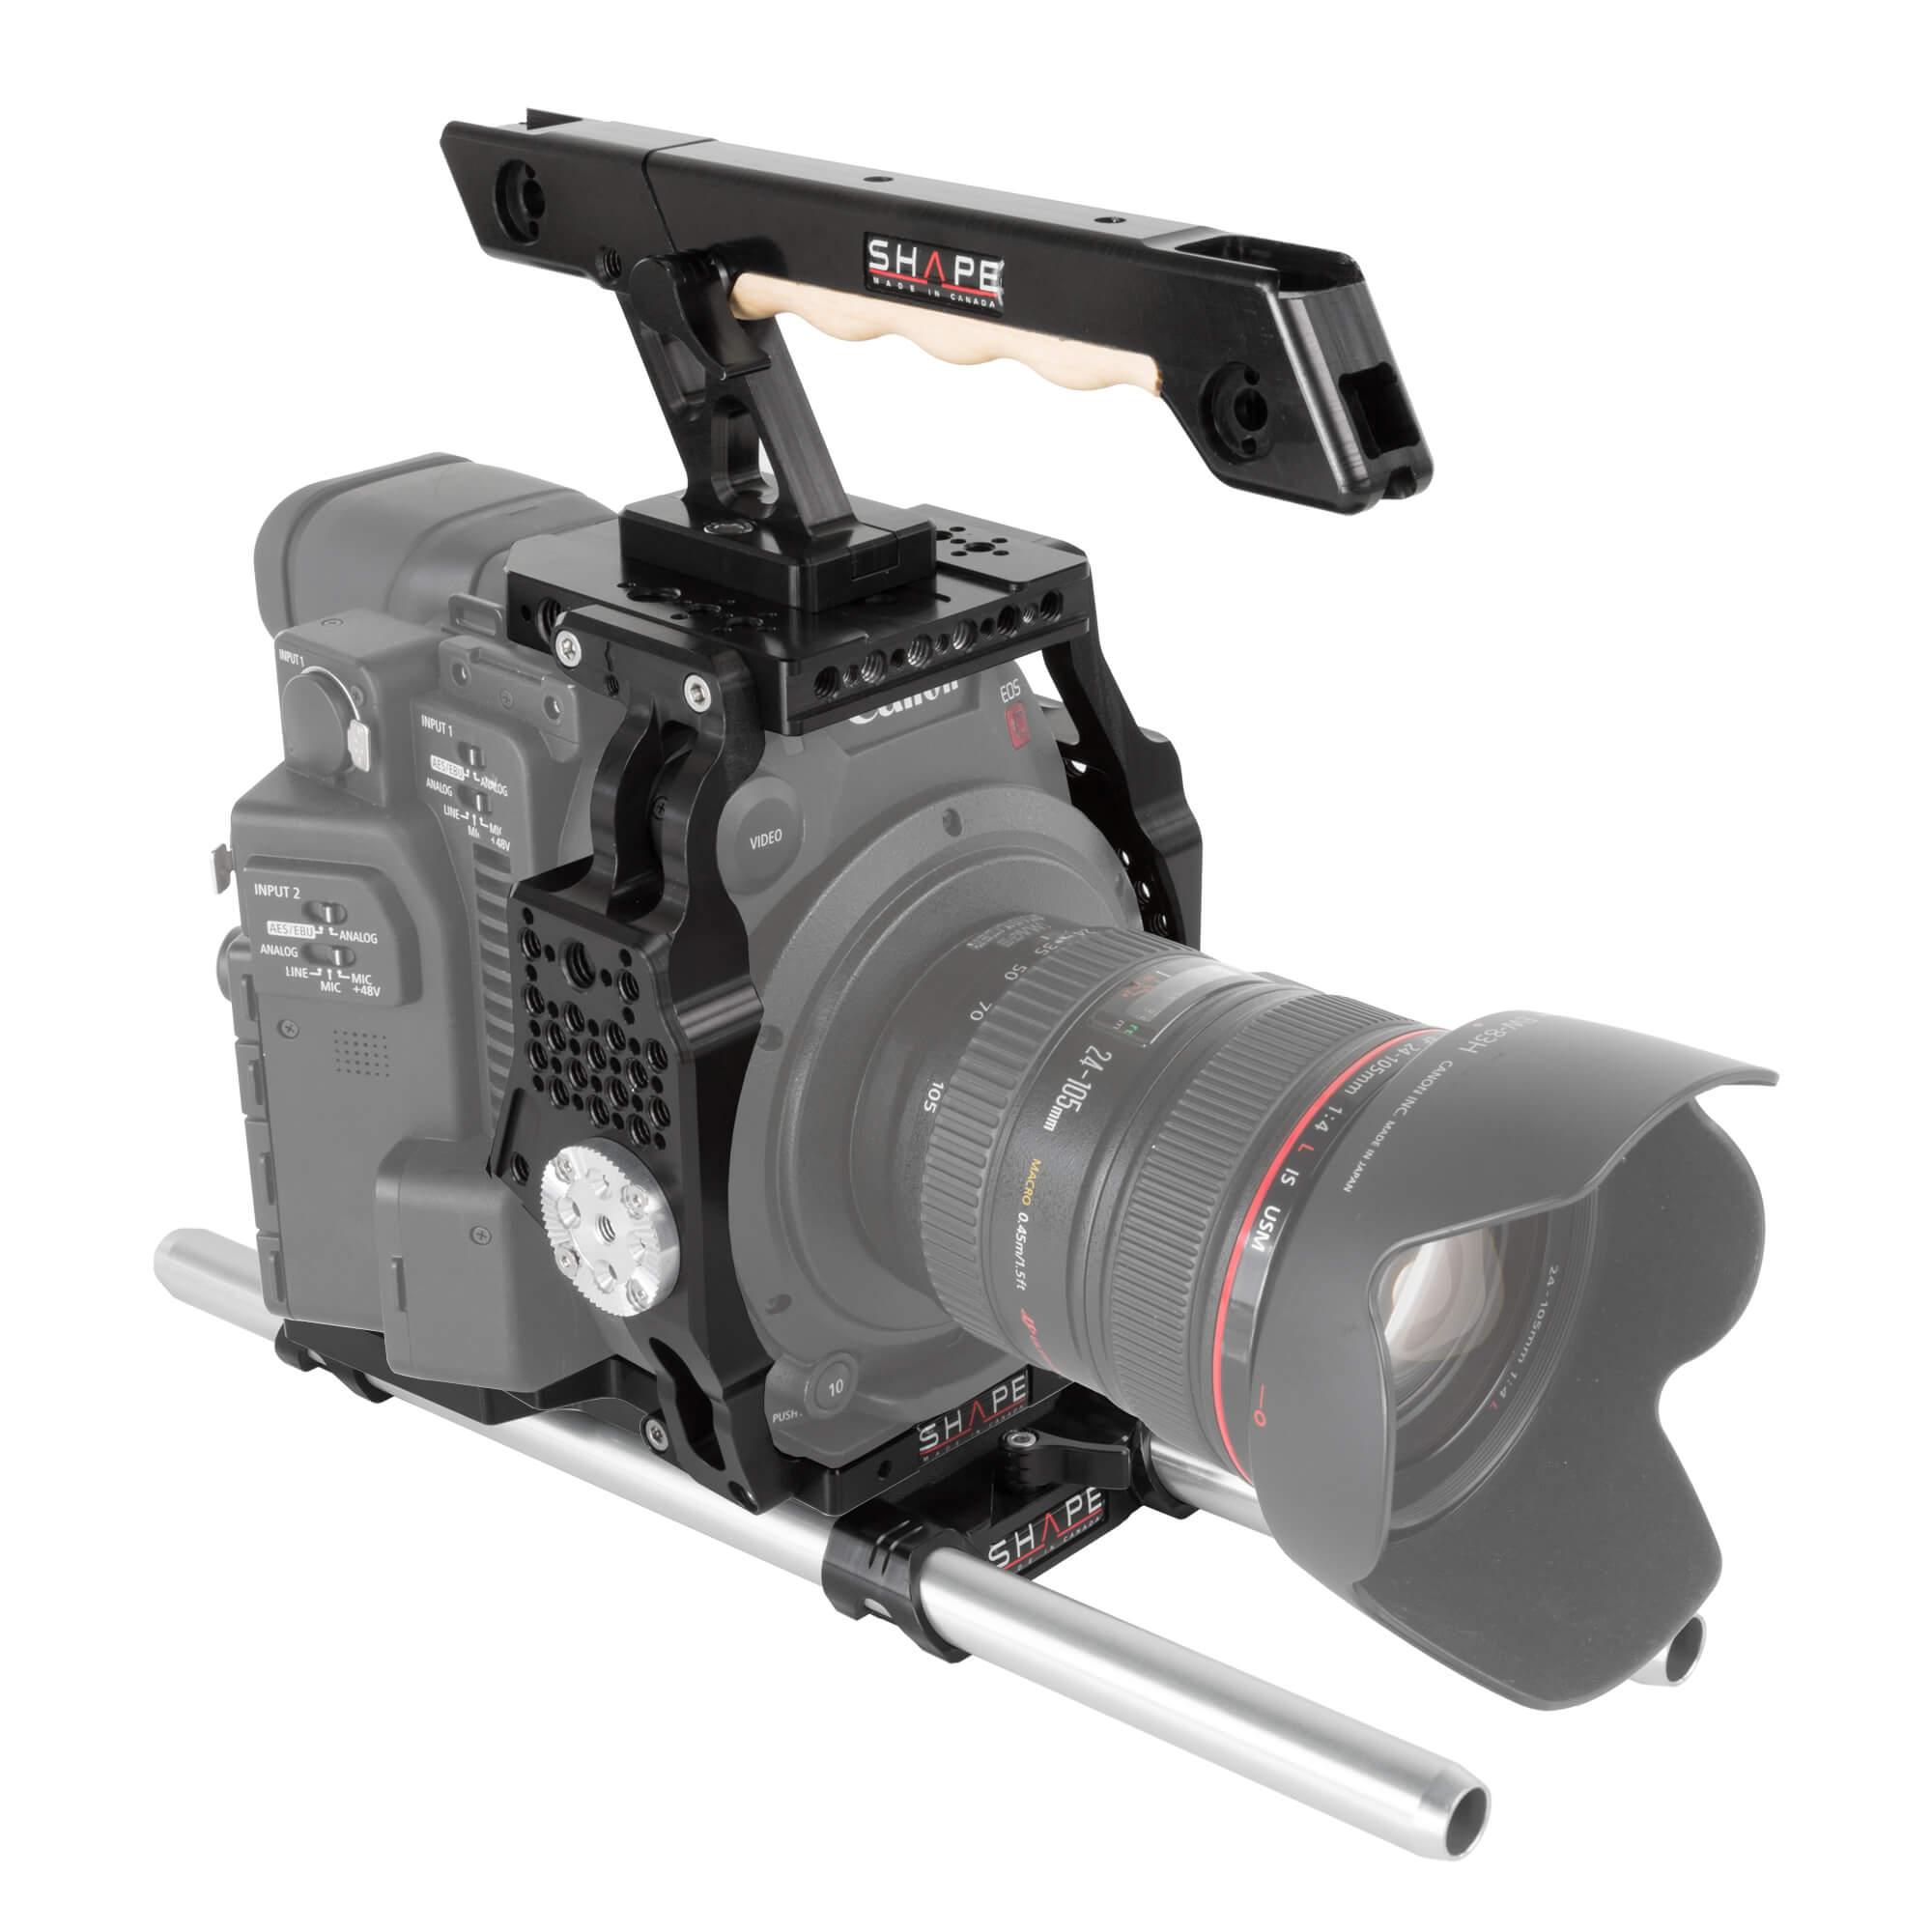 Canon C200 cage 15 mm LW rod - SHAPE